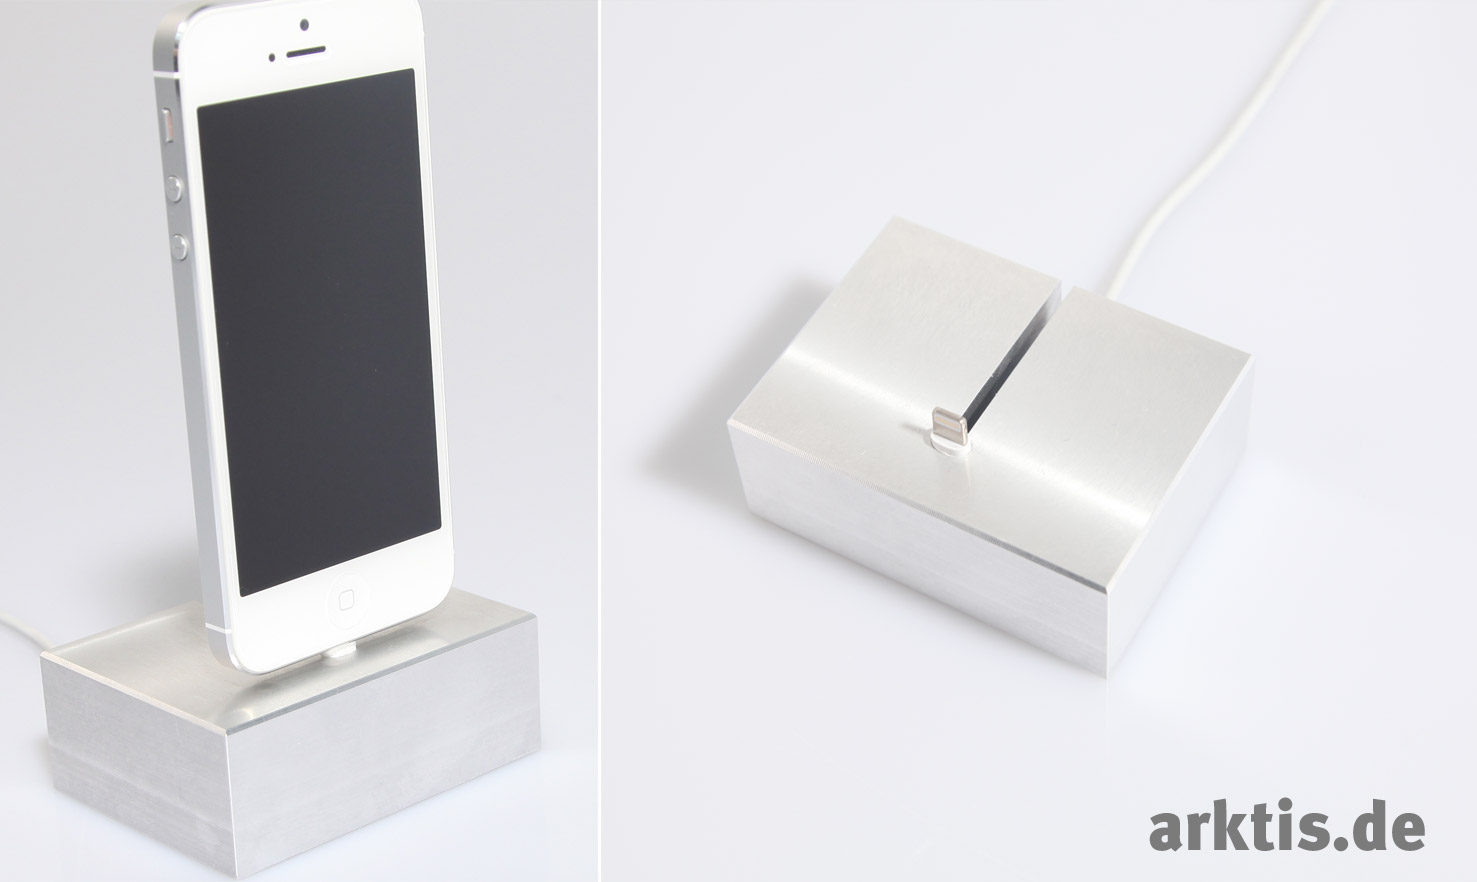 Exklusiv bei arktis.de: Das iPhone 5 Dock | arktis.de Blog